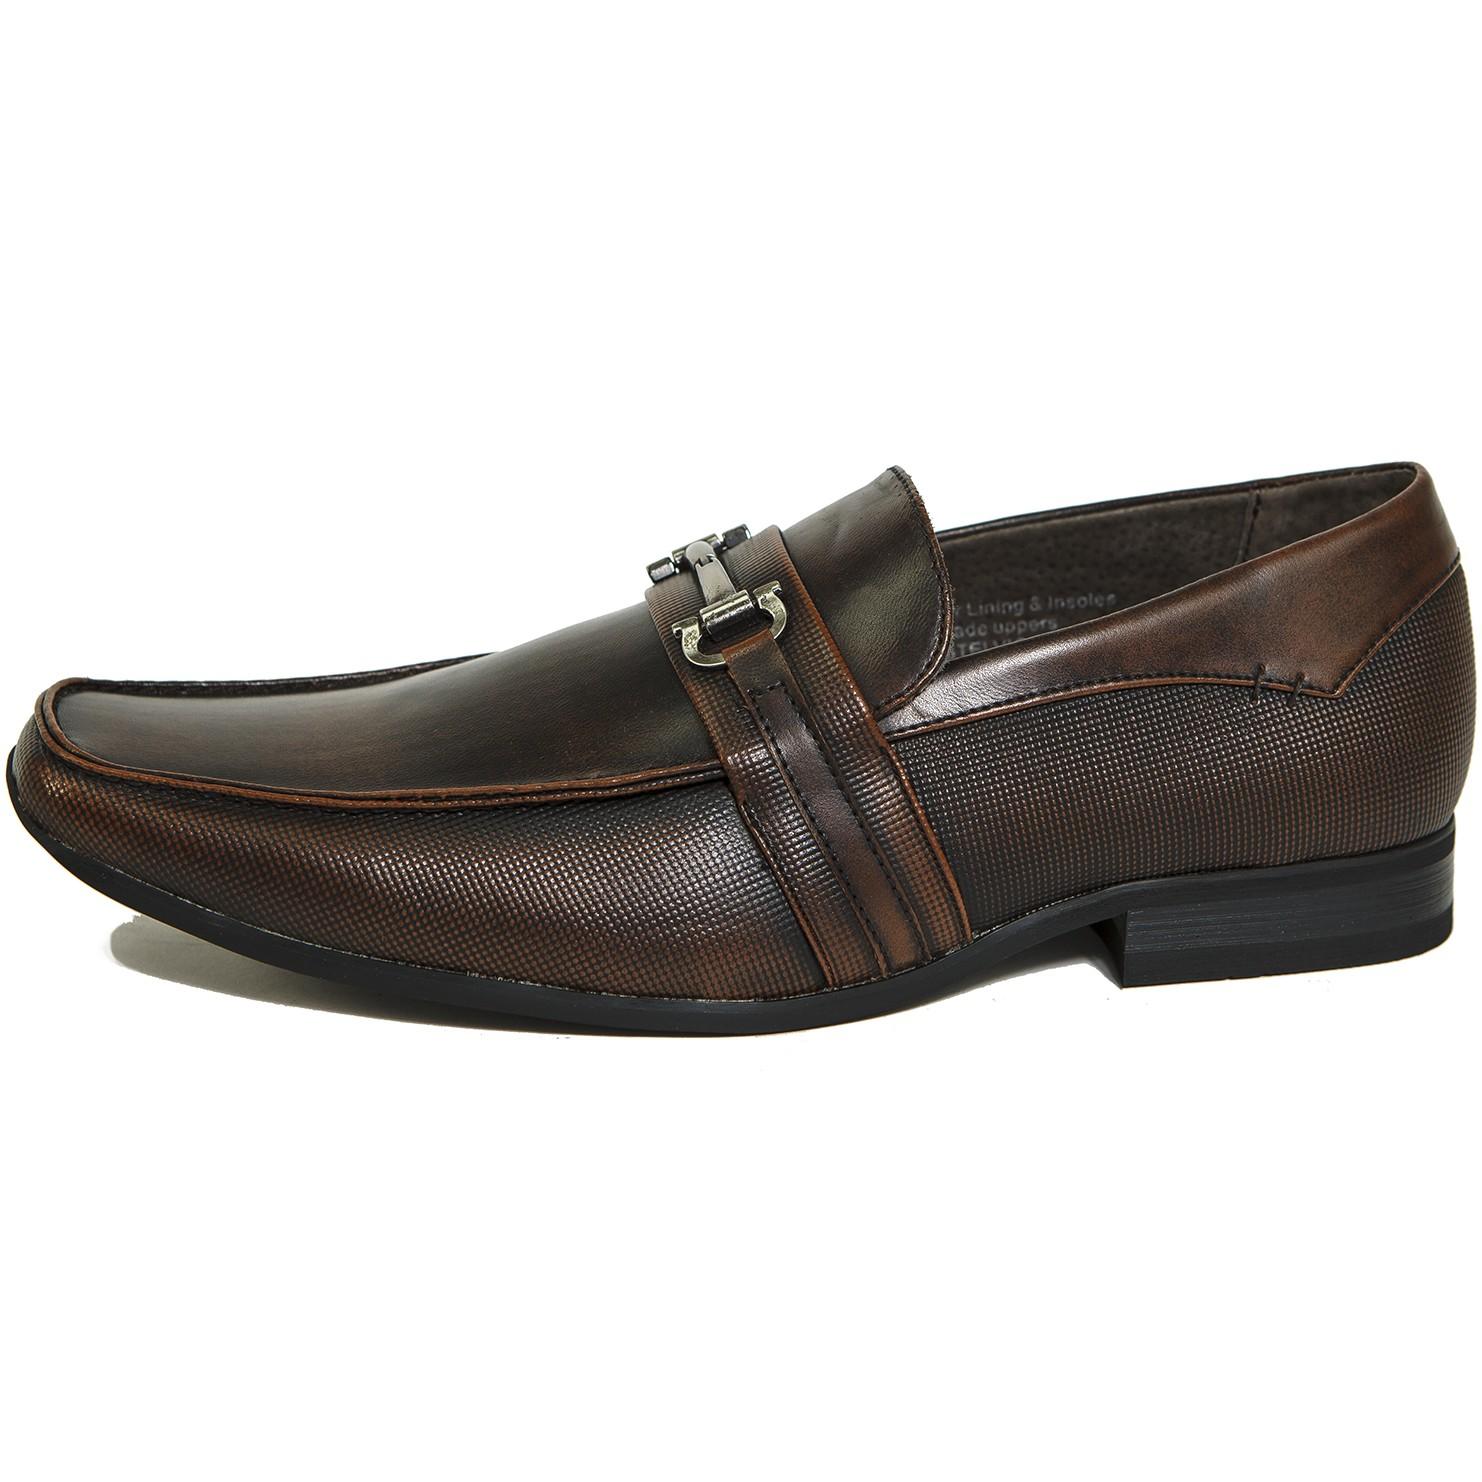 alpine swiss stelvio mens buckle loafers slip on tapered